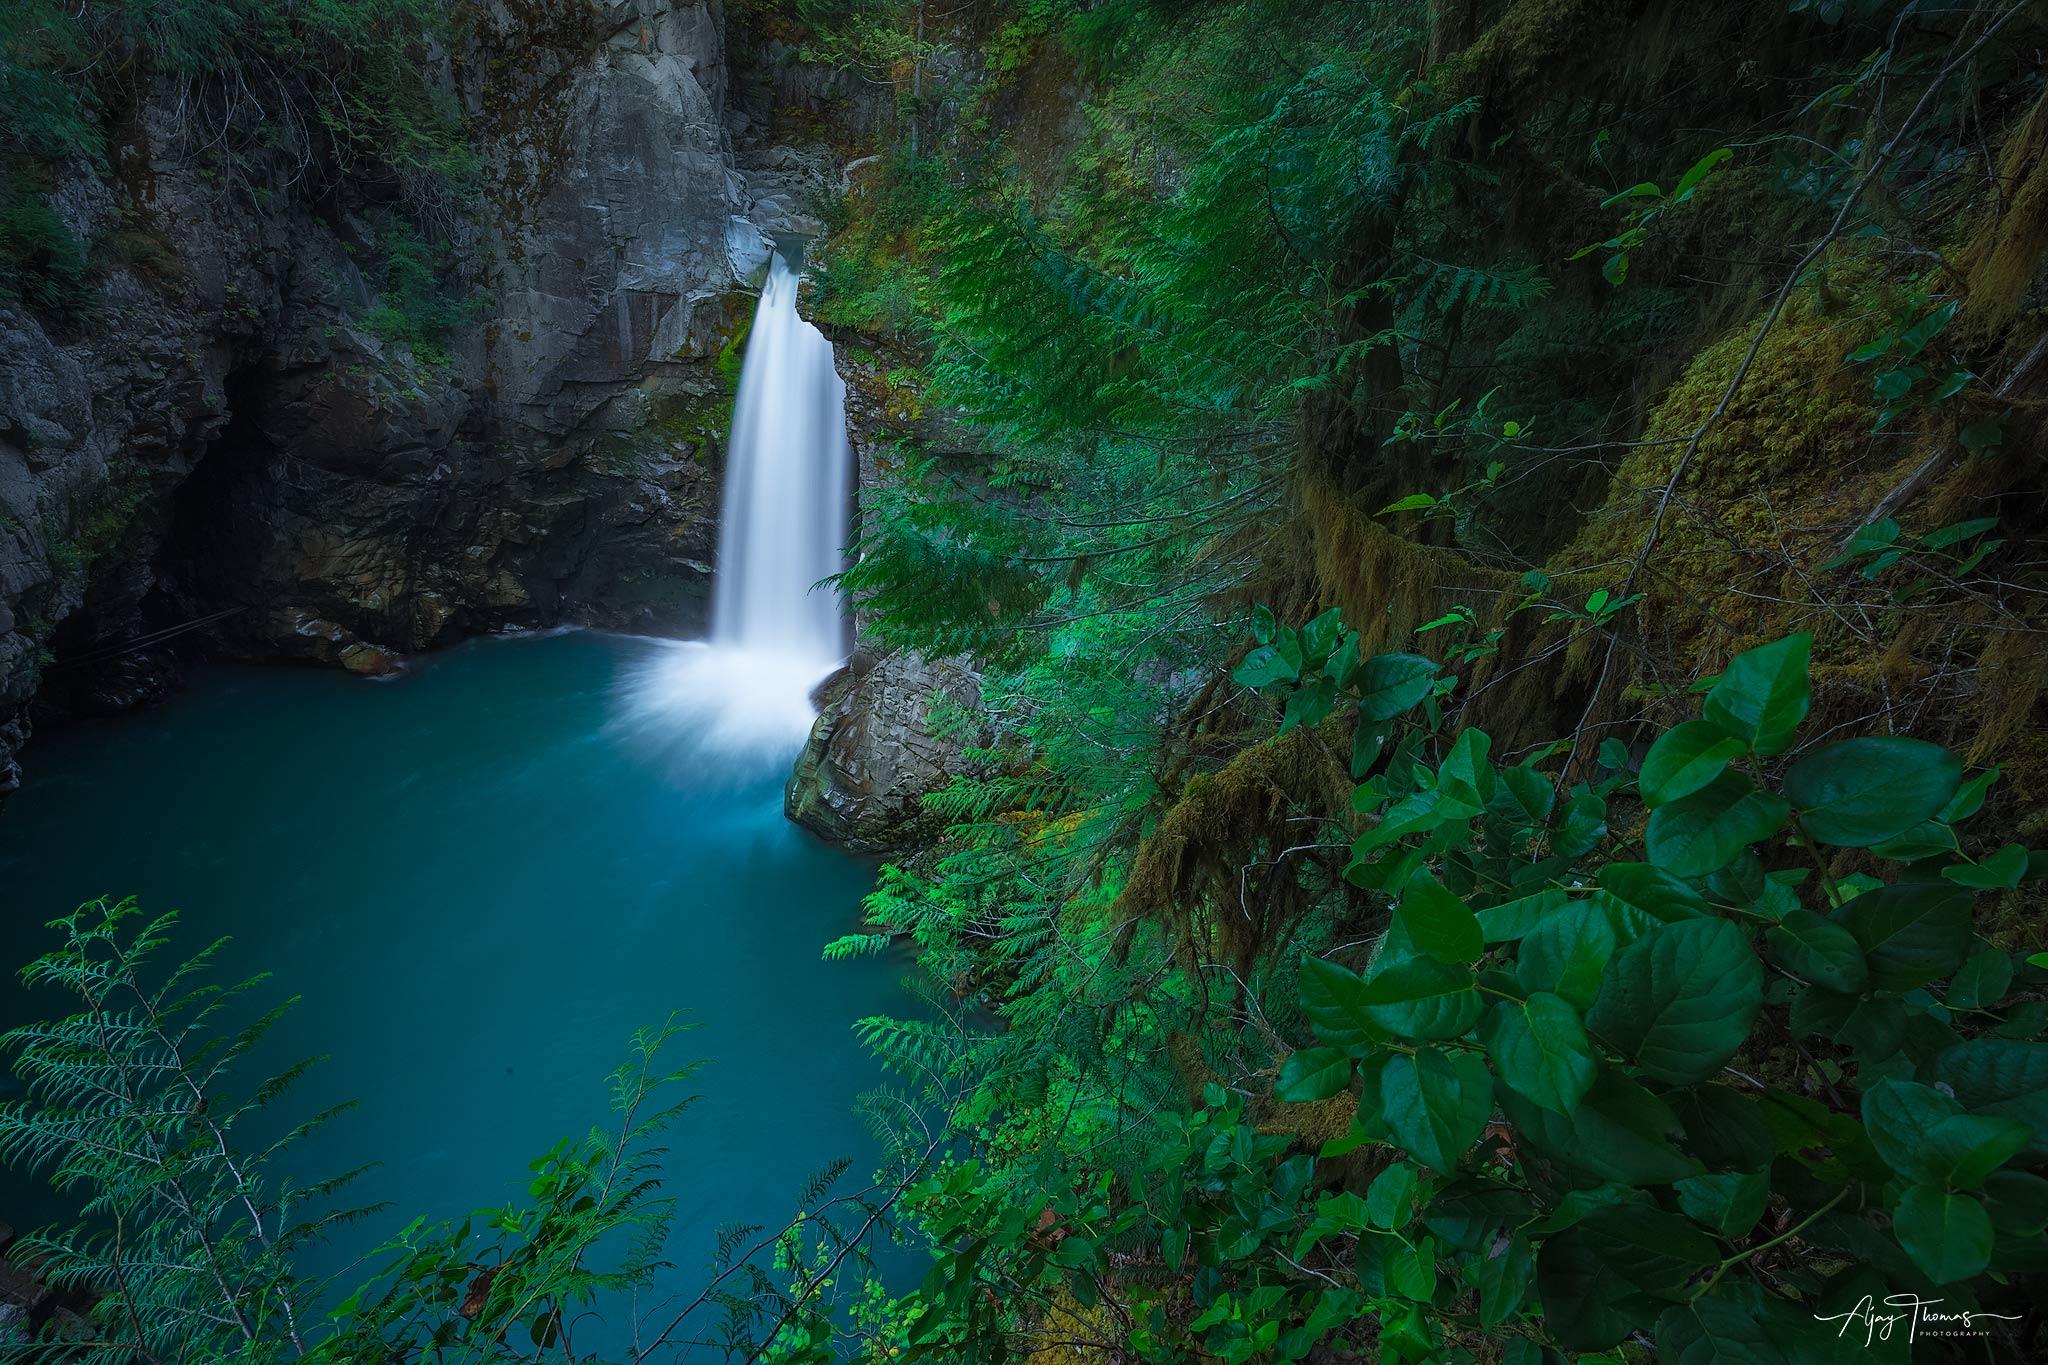 waterfall,waterfalls,forest,Stream,creek